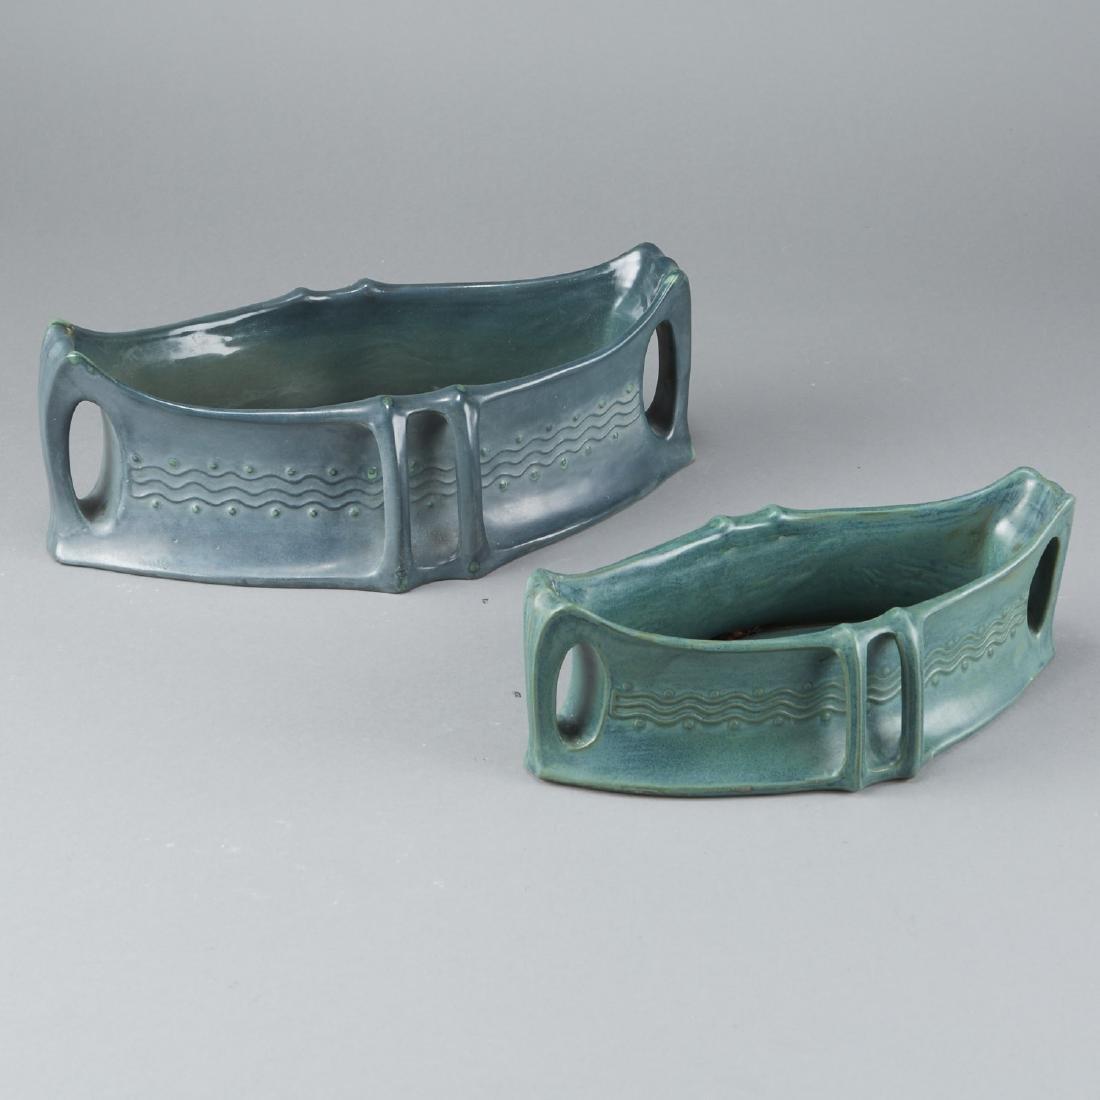 Pair of Amphora Arts and Crafts Basin